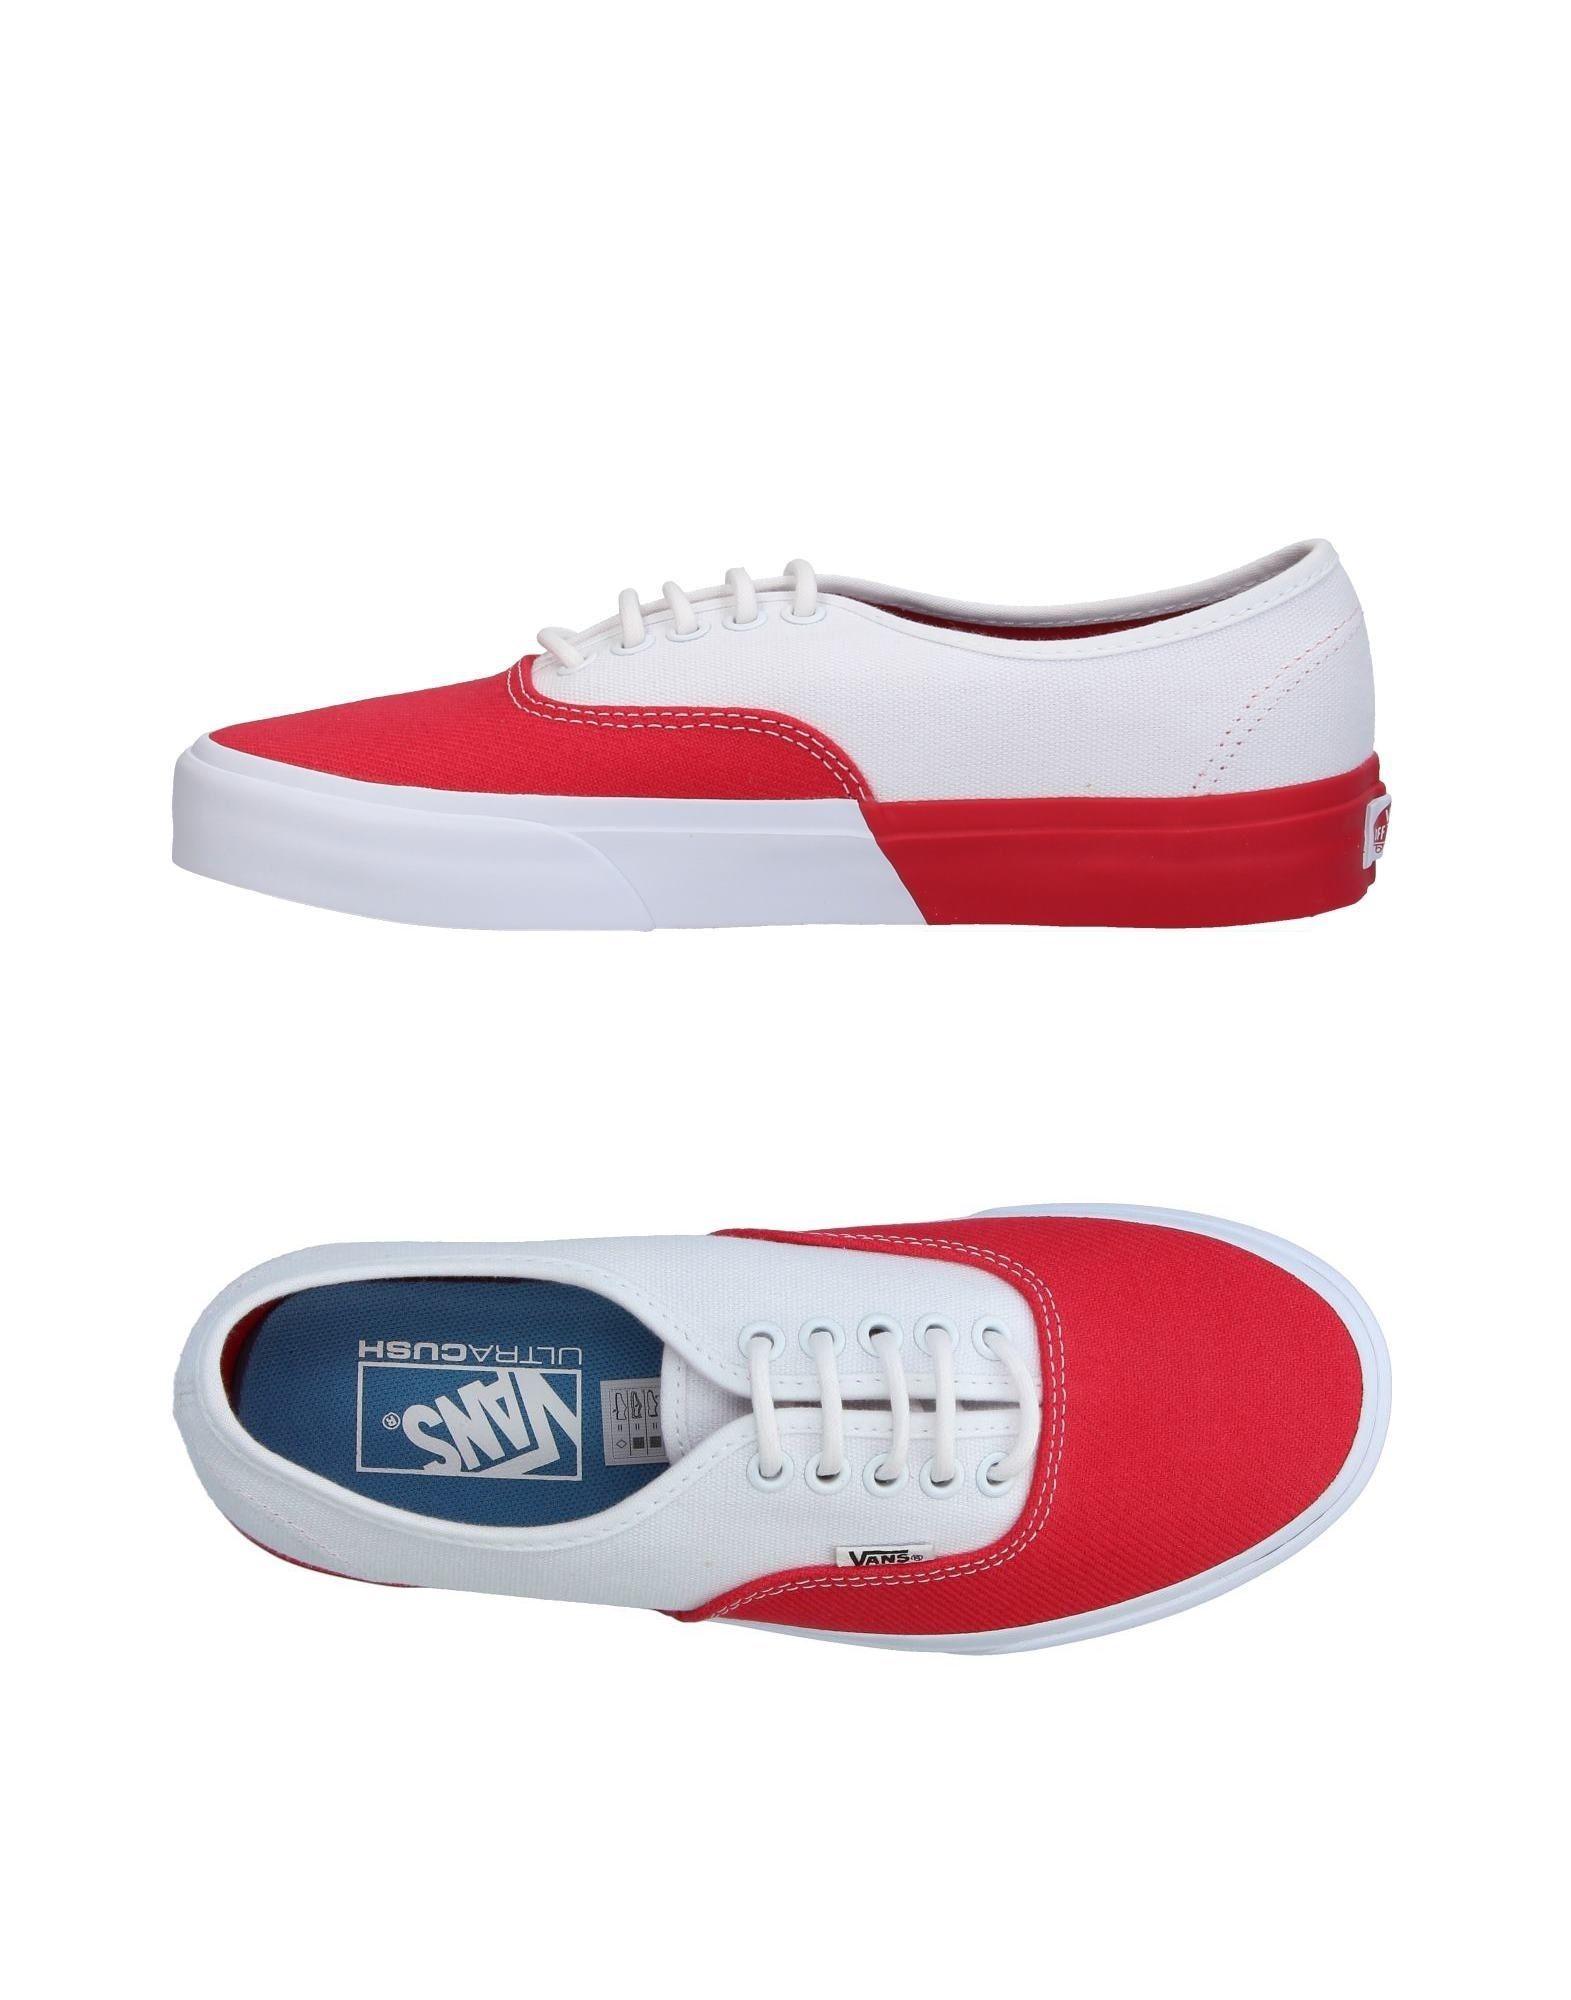 VANS Низкие кеды и кроссовки vans кеды vans authentic pro 50th 66 duke red white 10 5